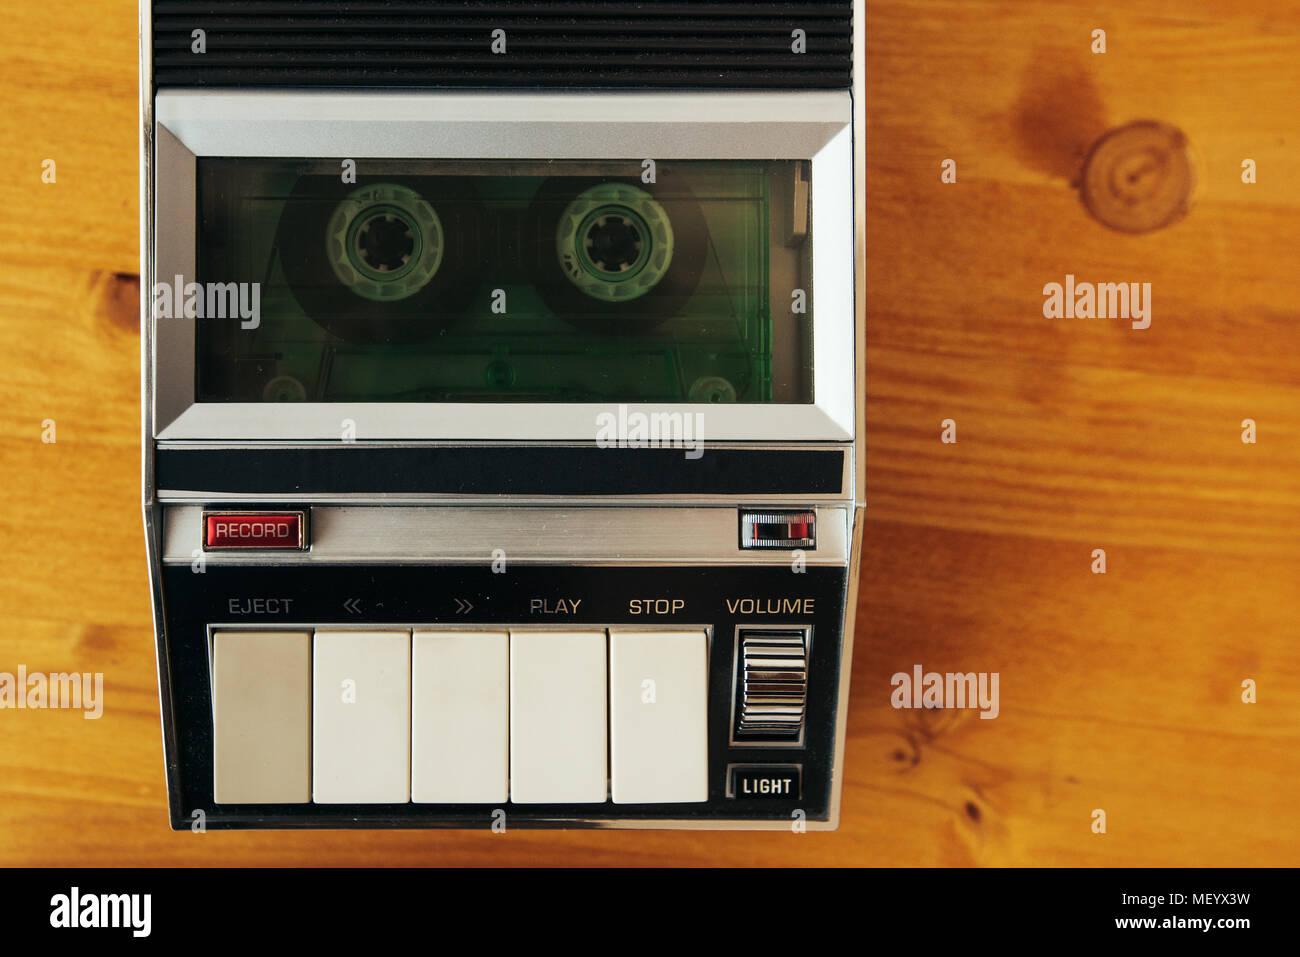 Tape Recorder 1970s Stock Photos & Tape Recorder 1970s Stock